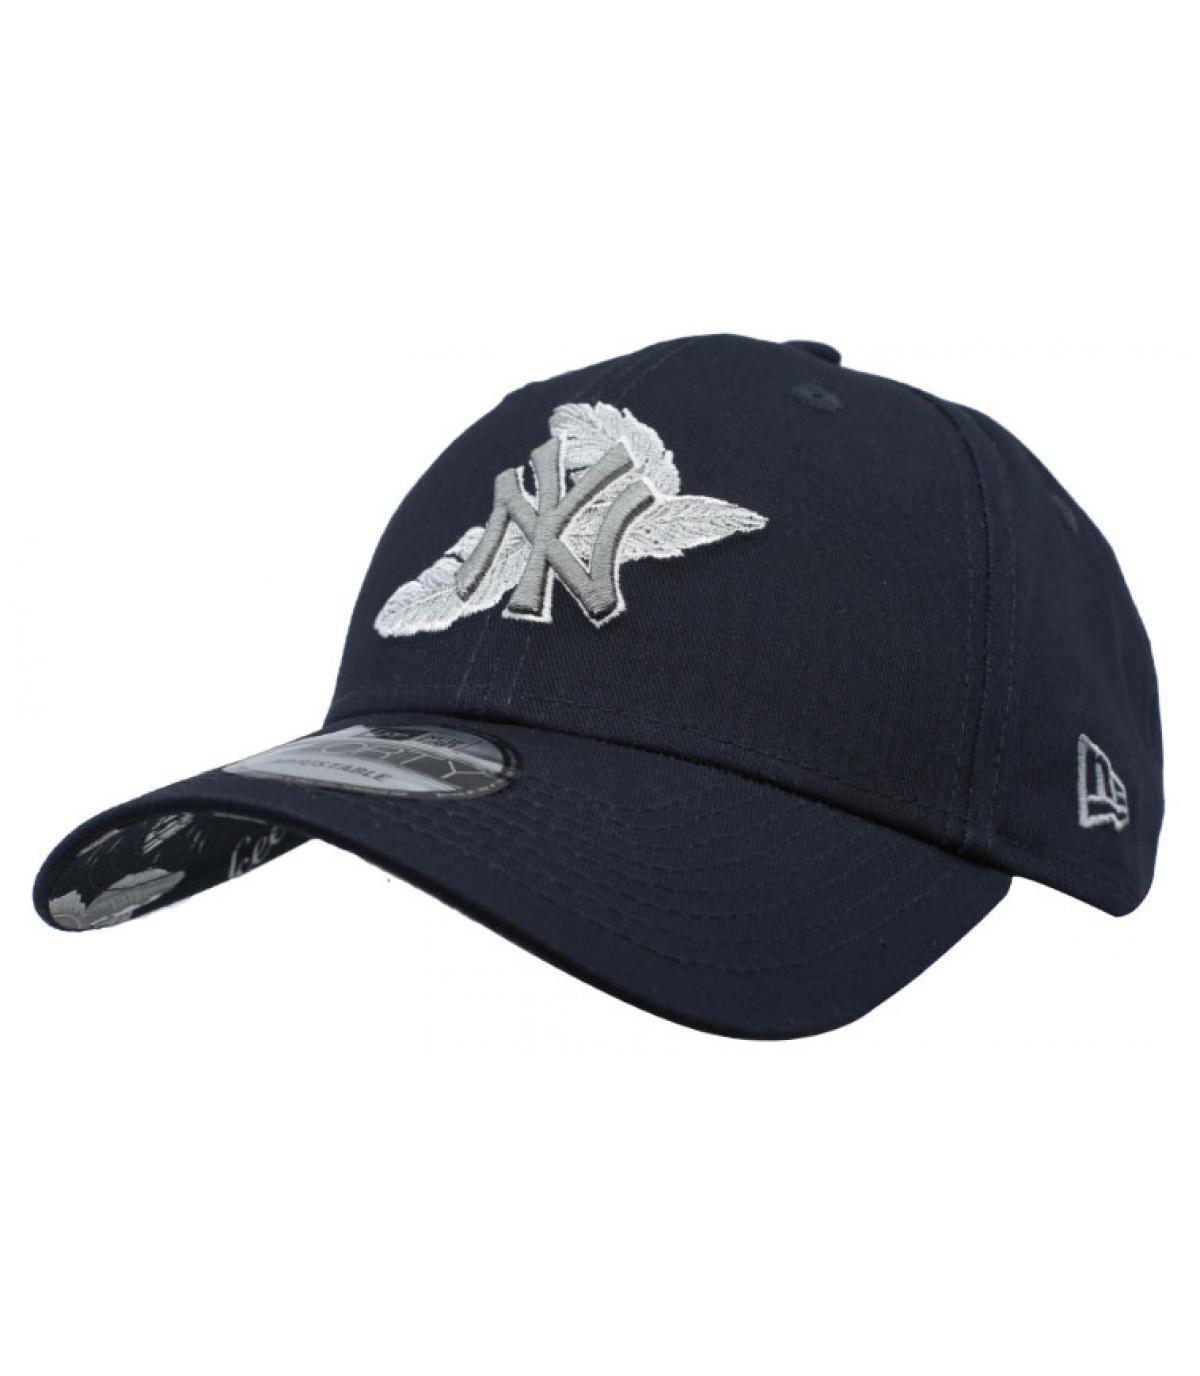 Details Cap MLB Light Weight NY 9Forty navy gray - Abbildung 2